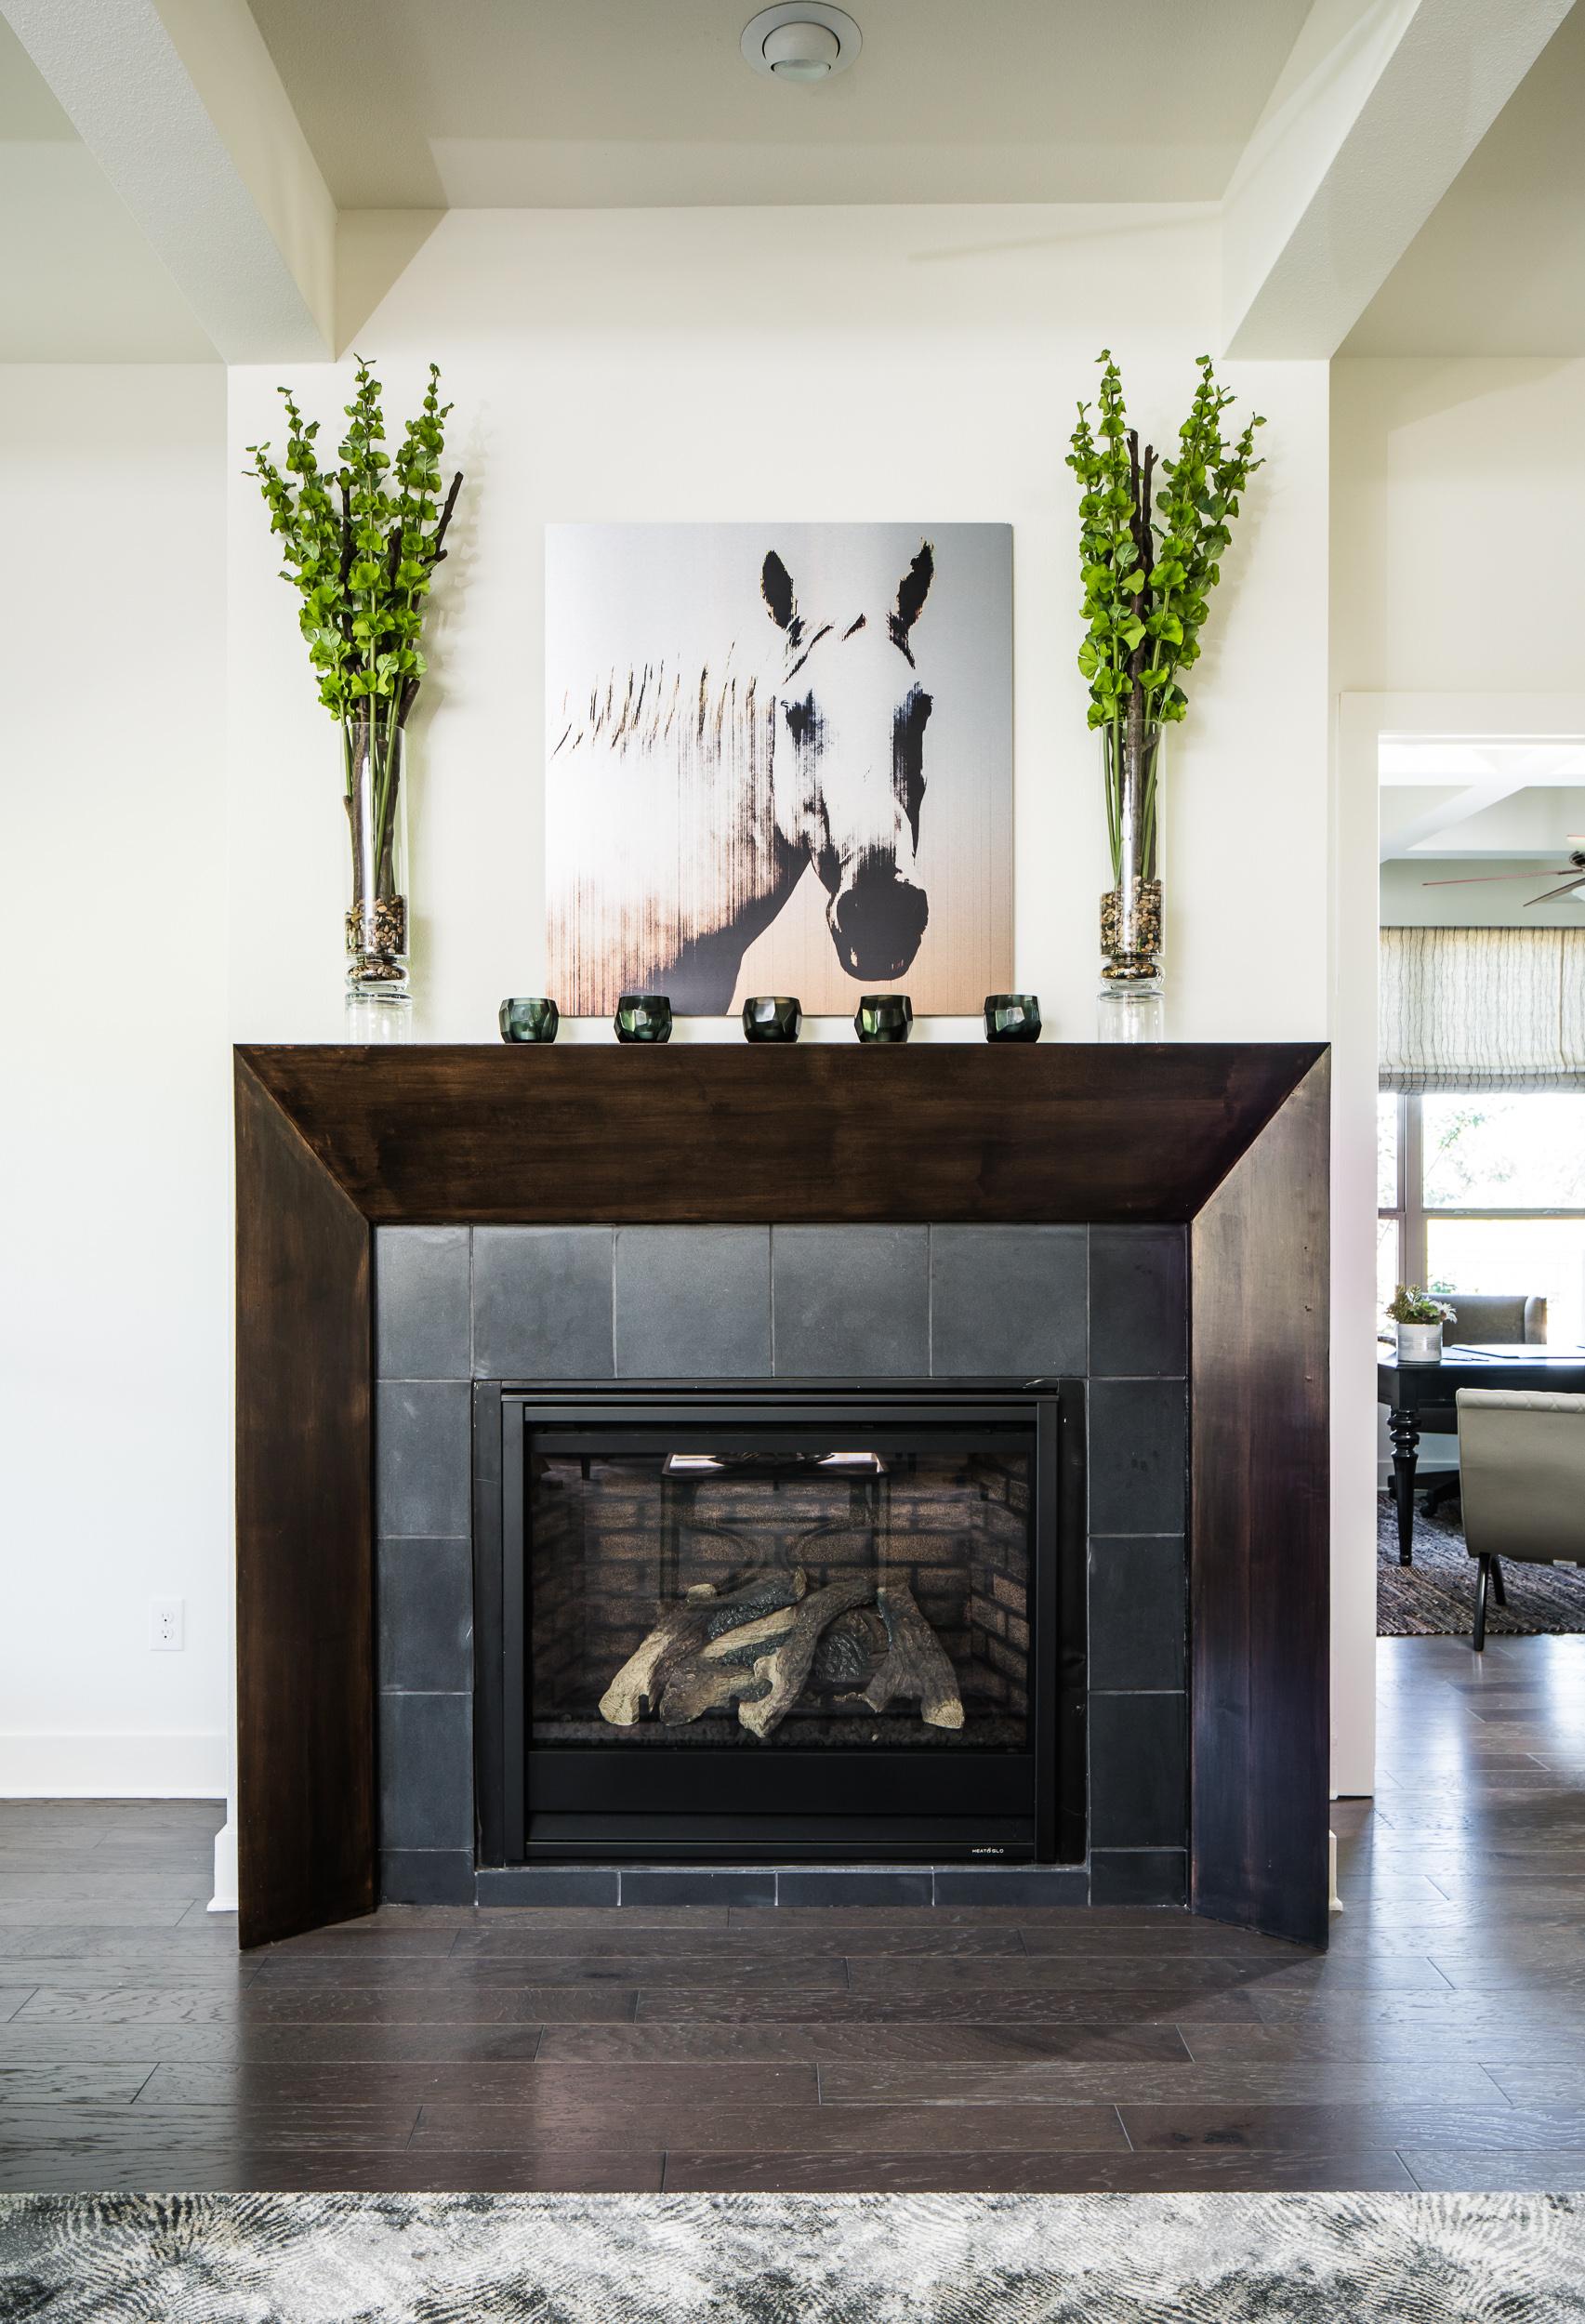 lori-caldwell-designs-interior-004.jpg